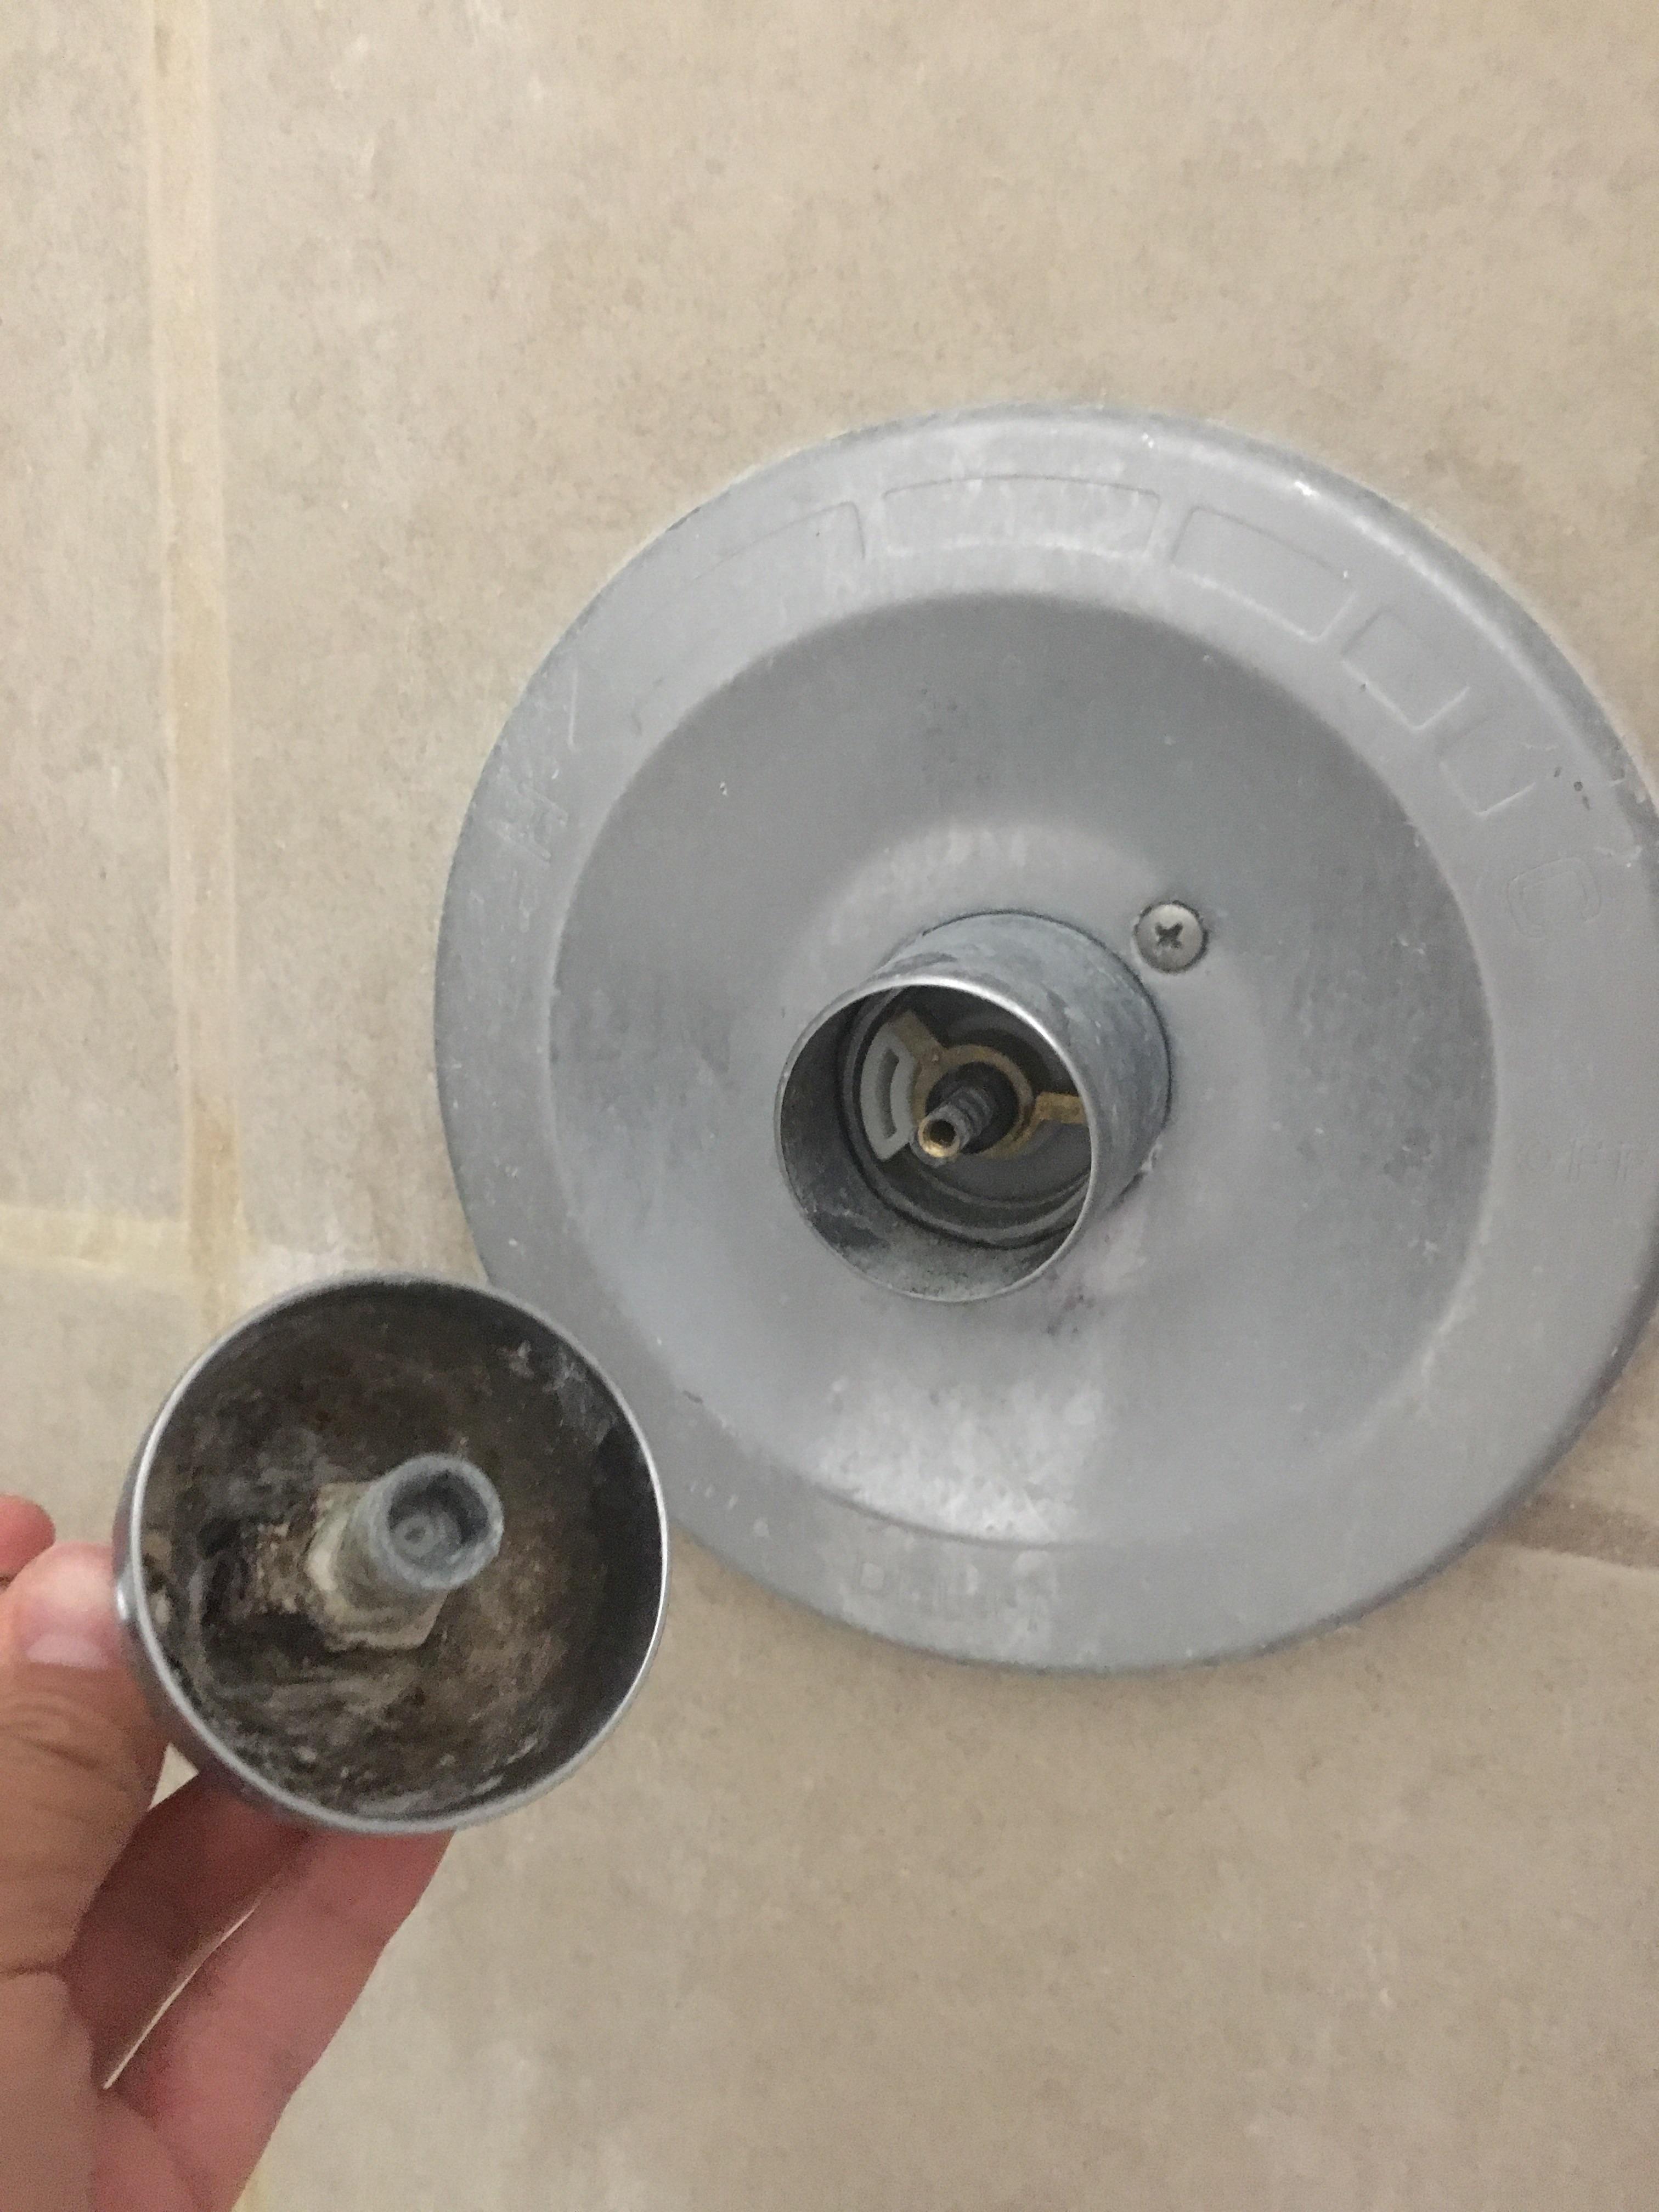 my delta shower handle keeps falling